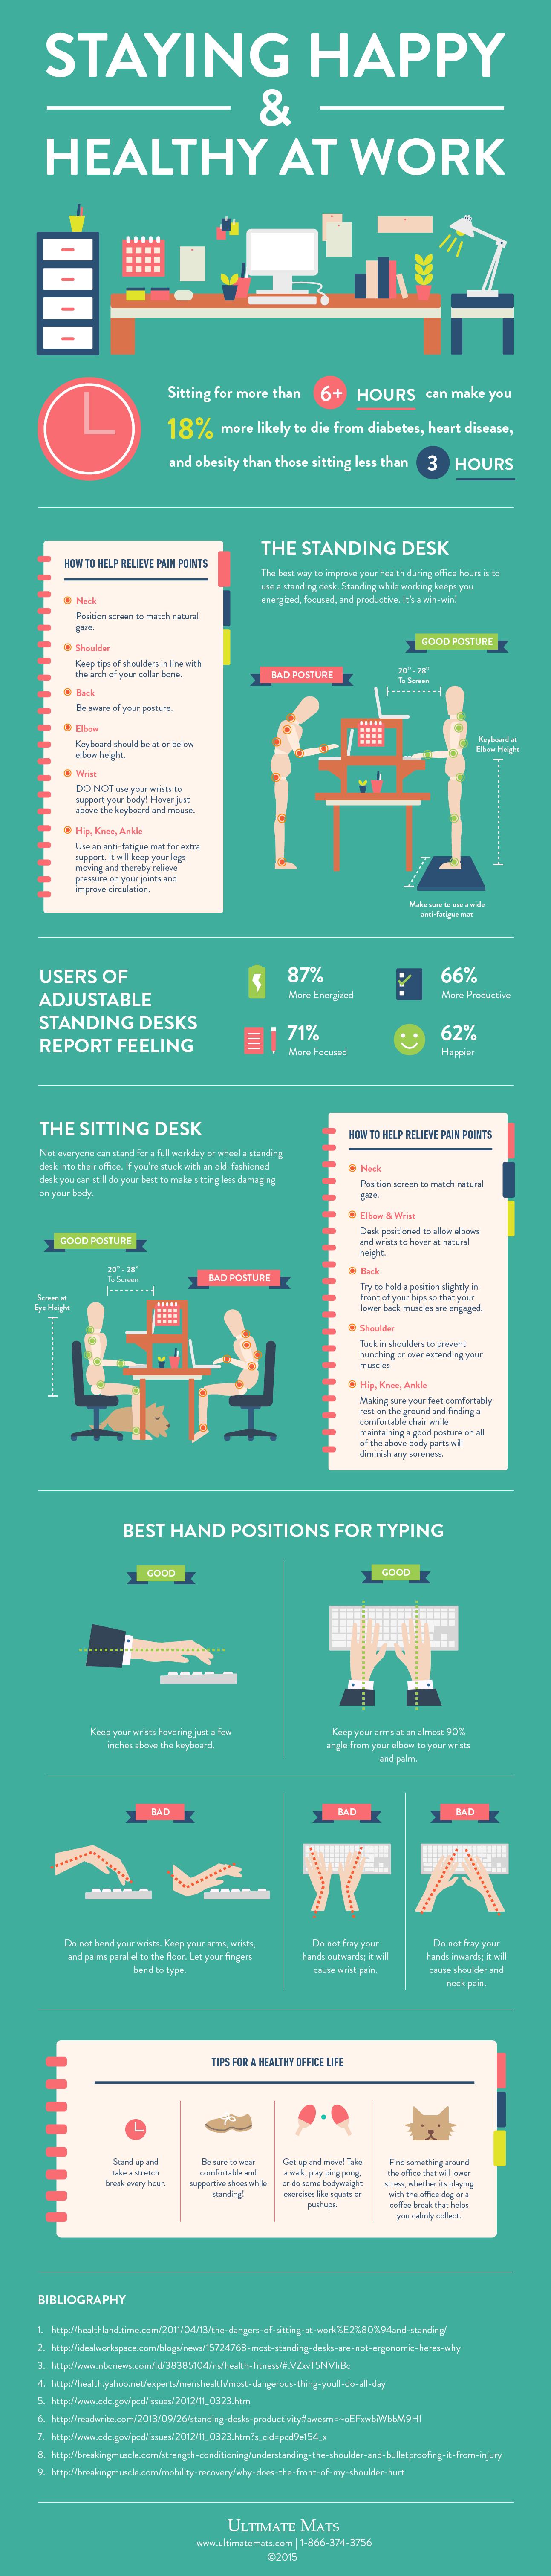 standing-desk-ergonomics-infographic.png